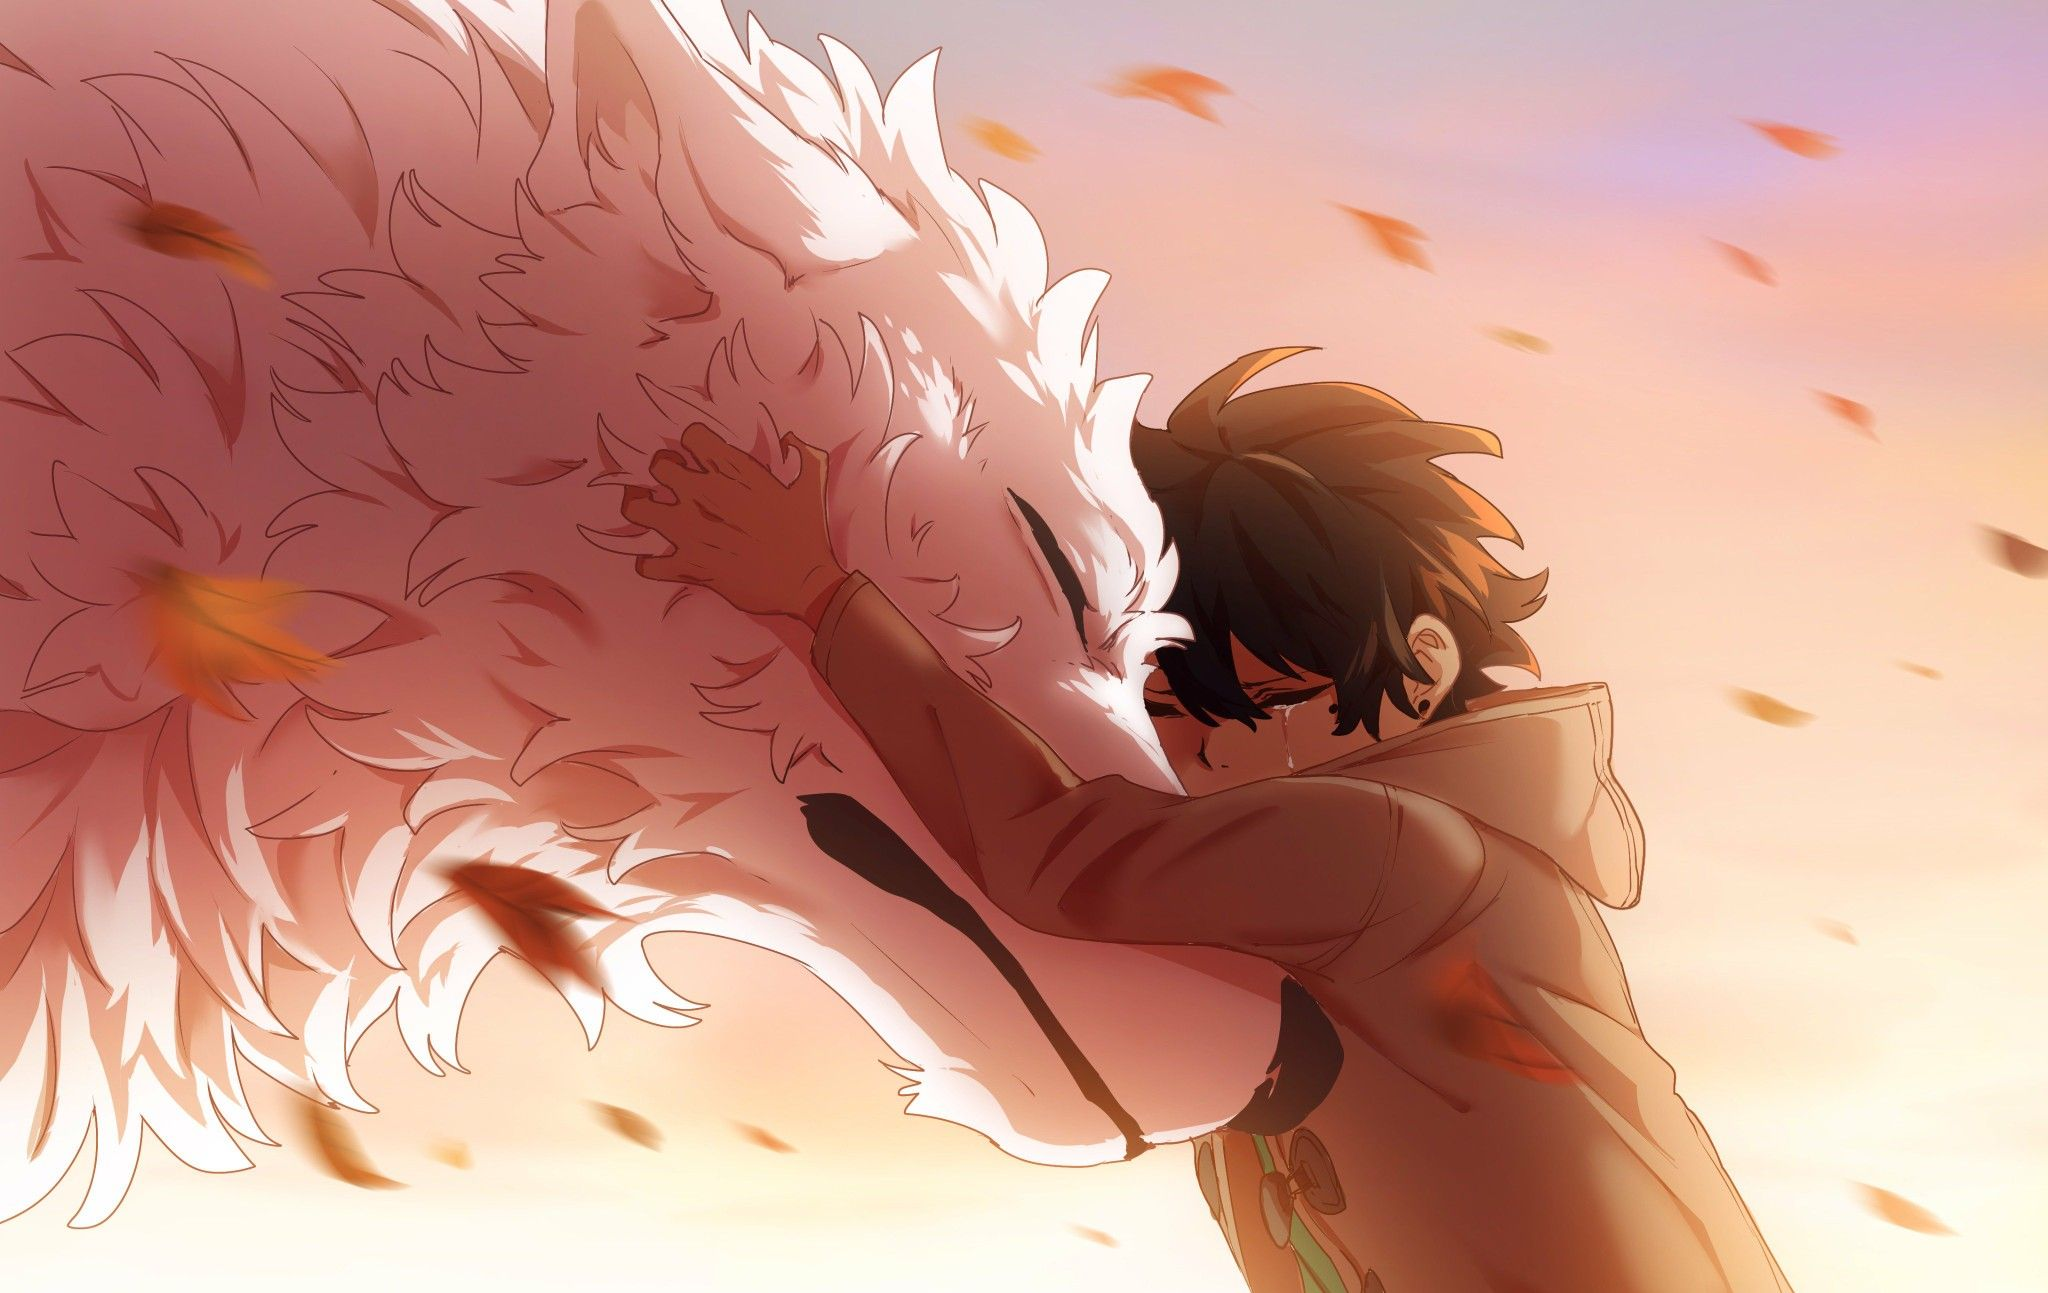 Lumine And Kody From Webtoon Emma Krogell Anime